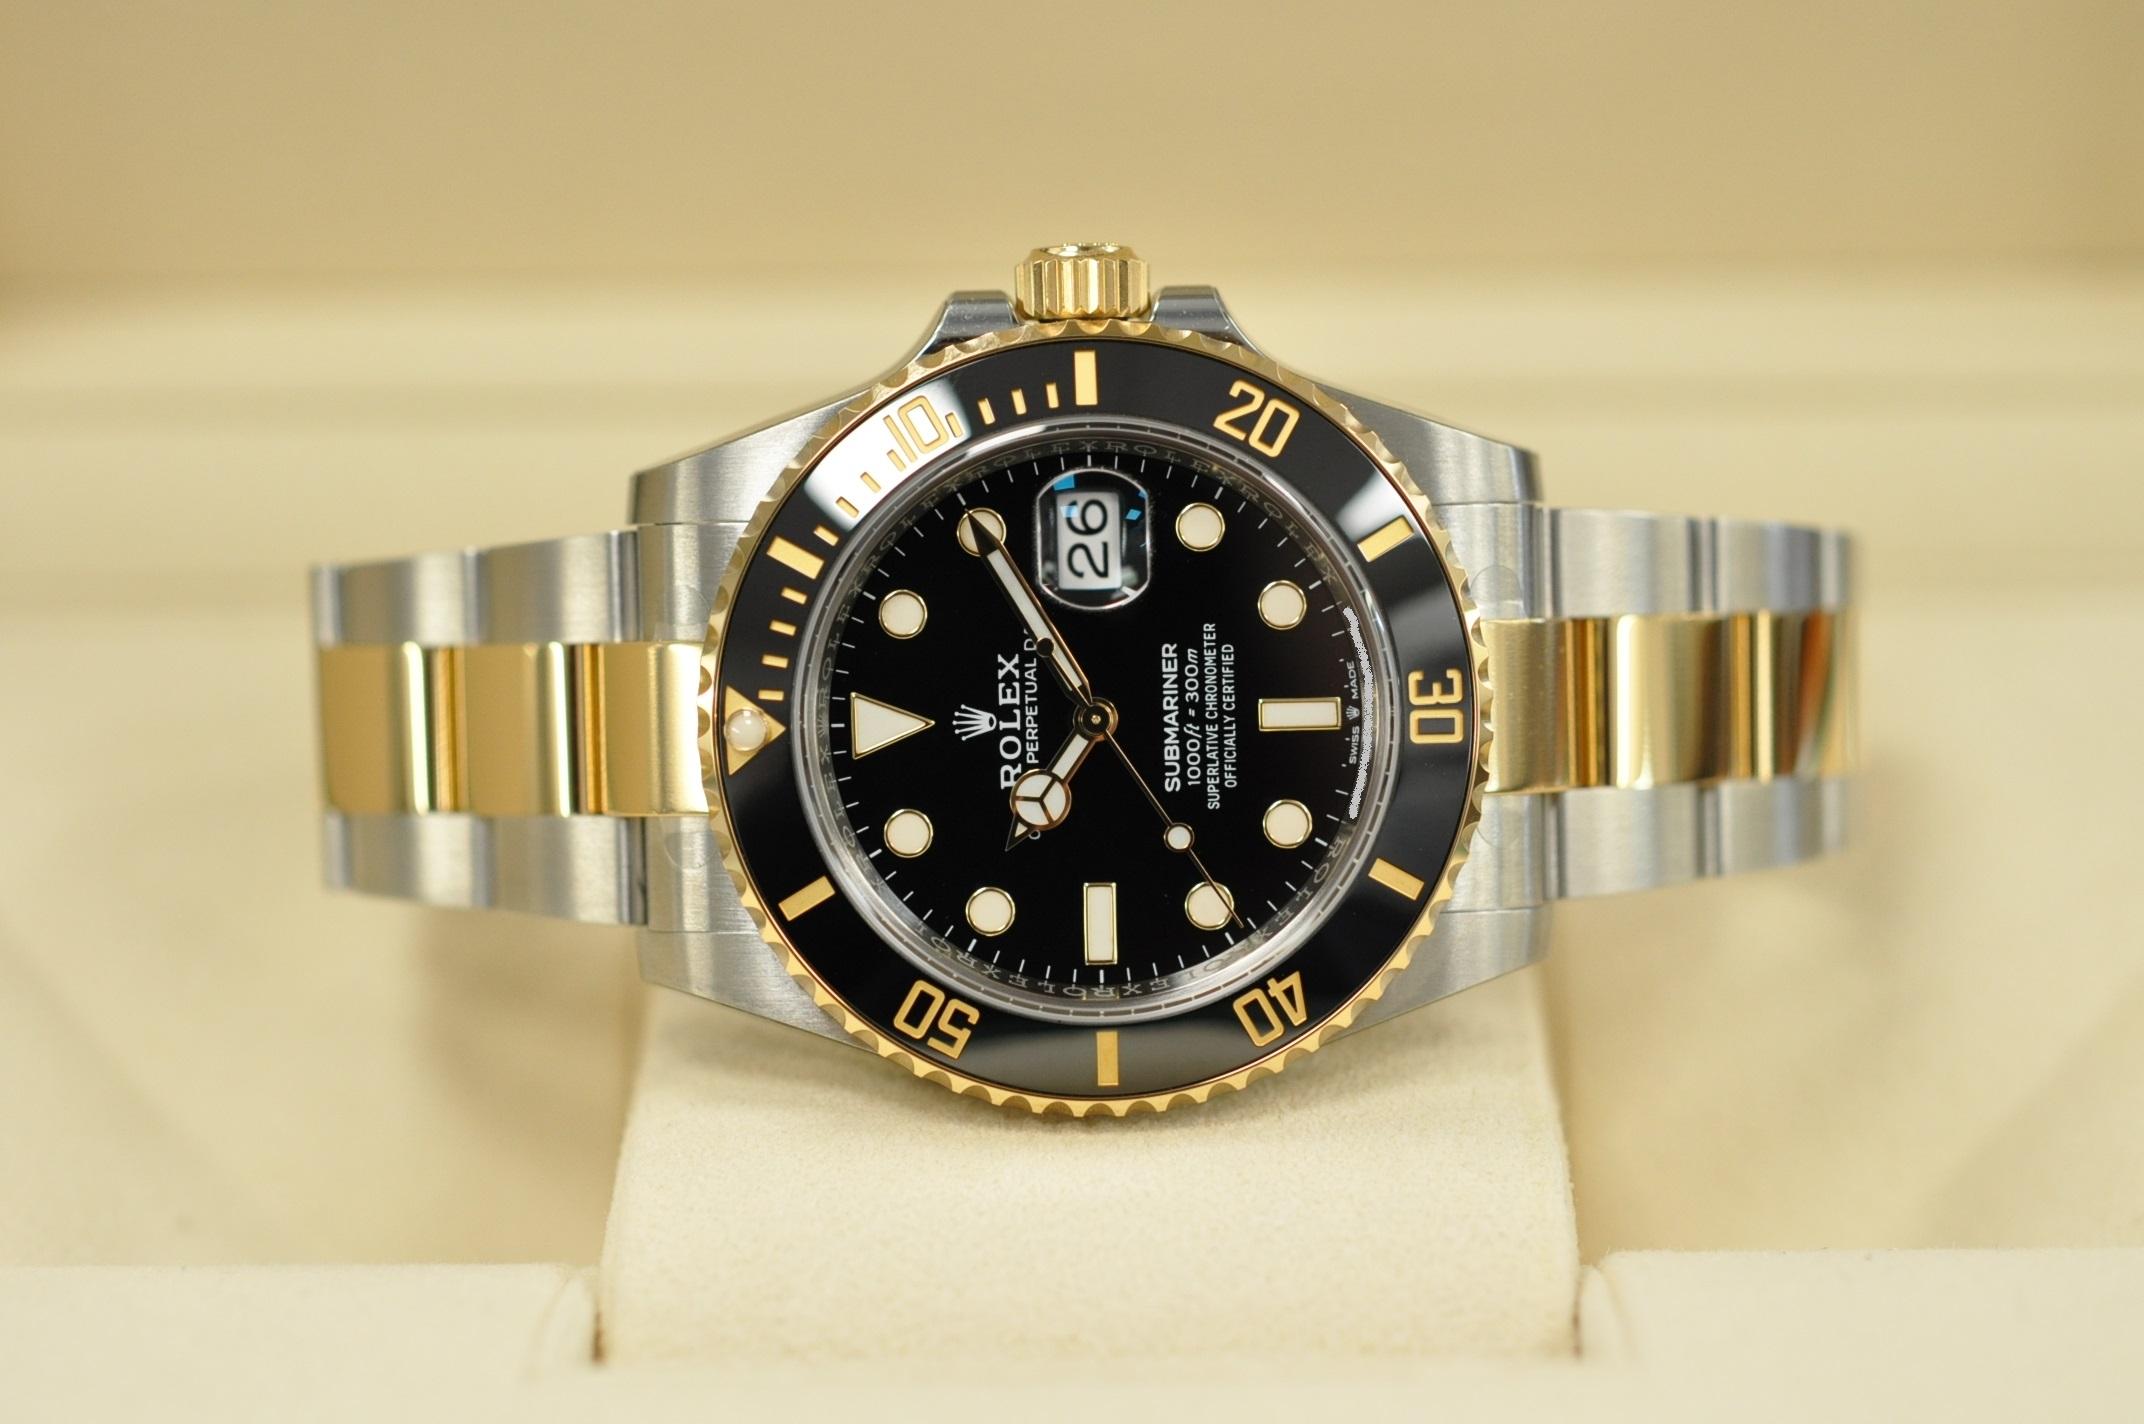 Submariner-Date 126613LN